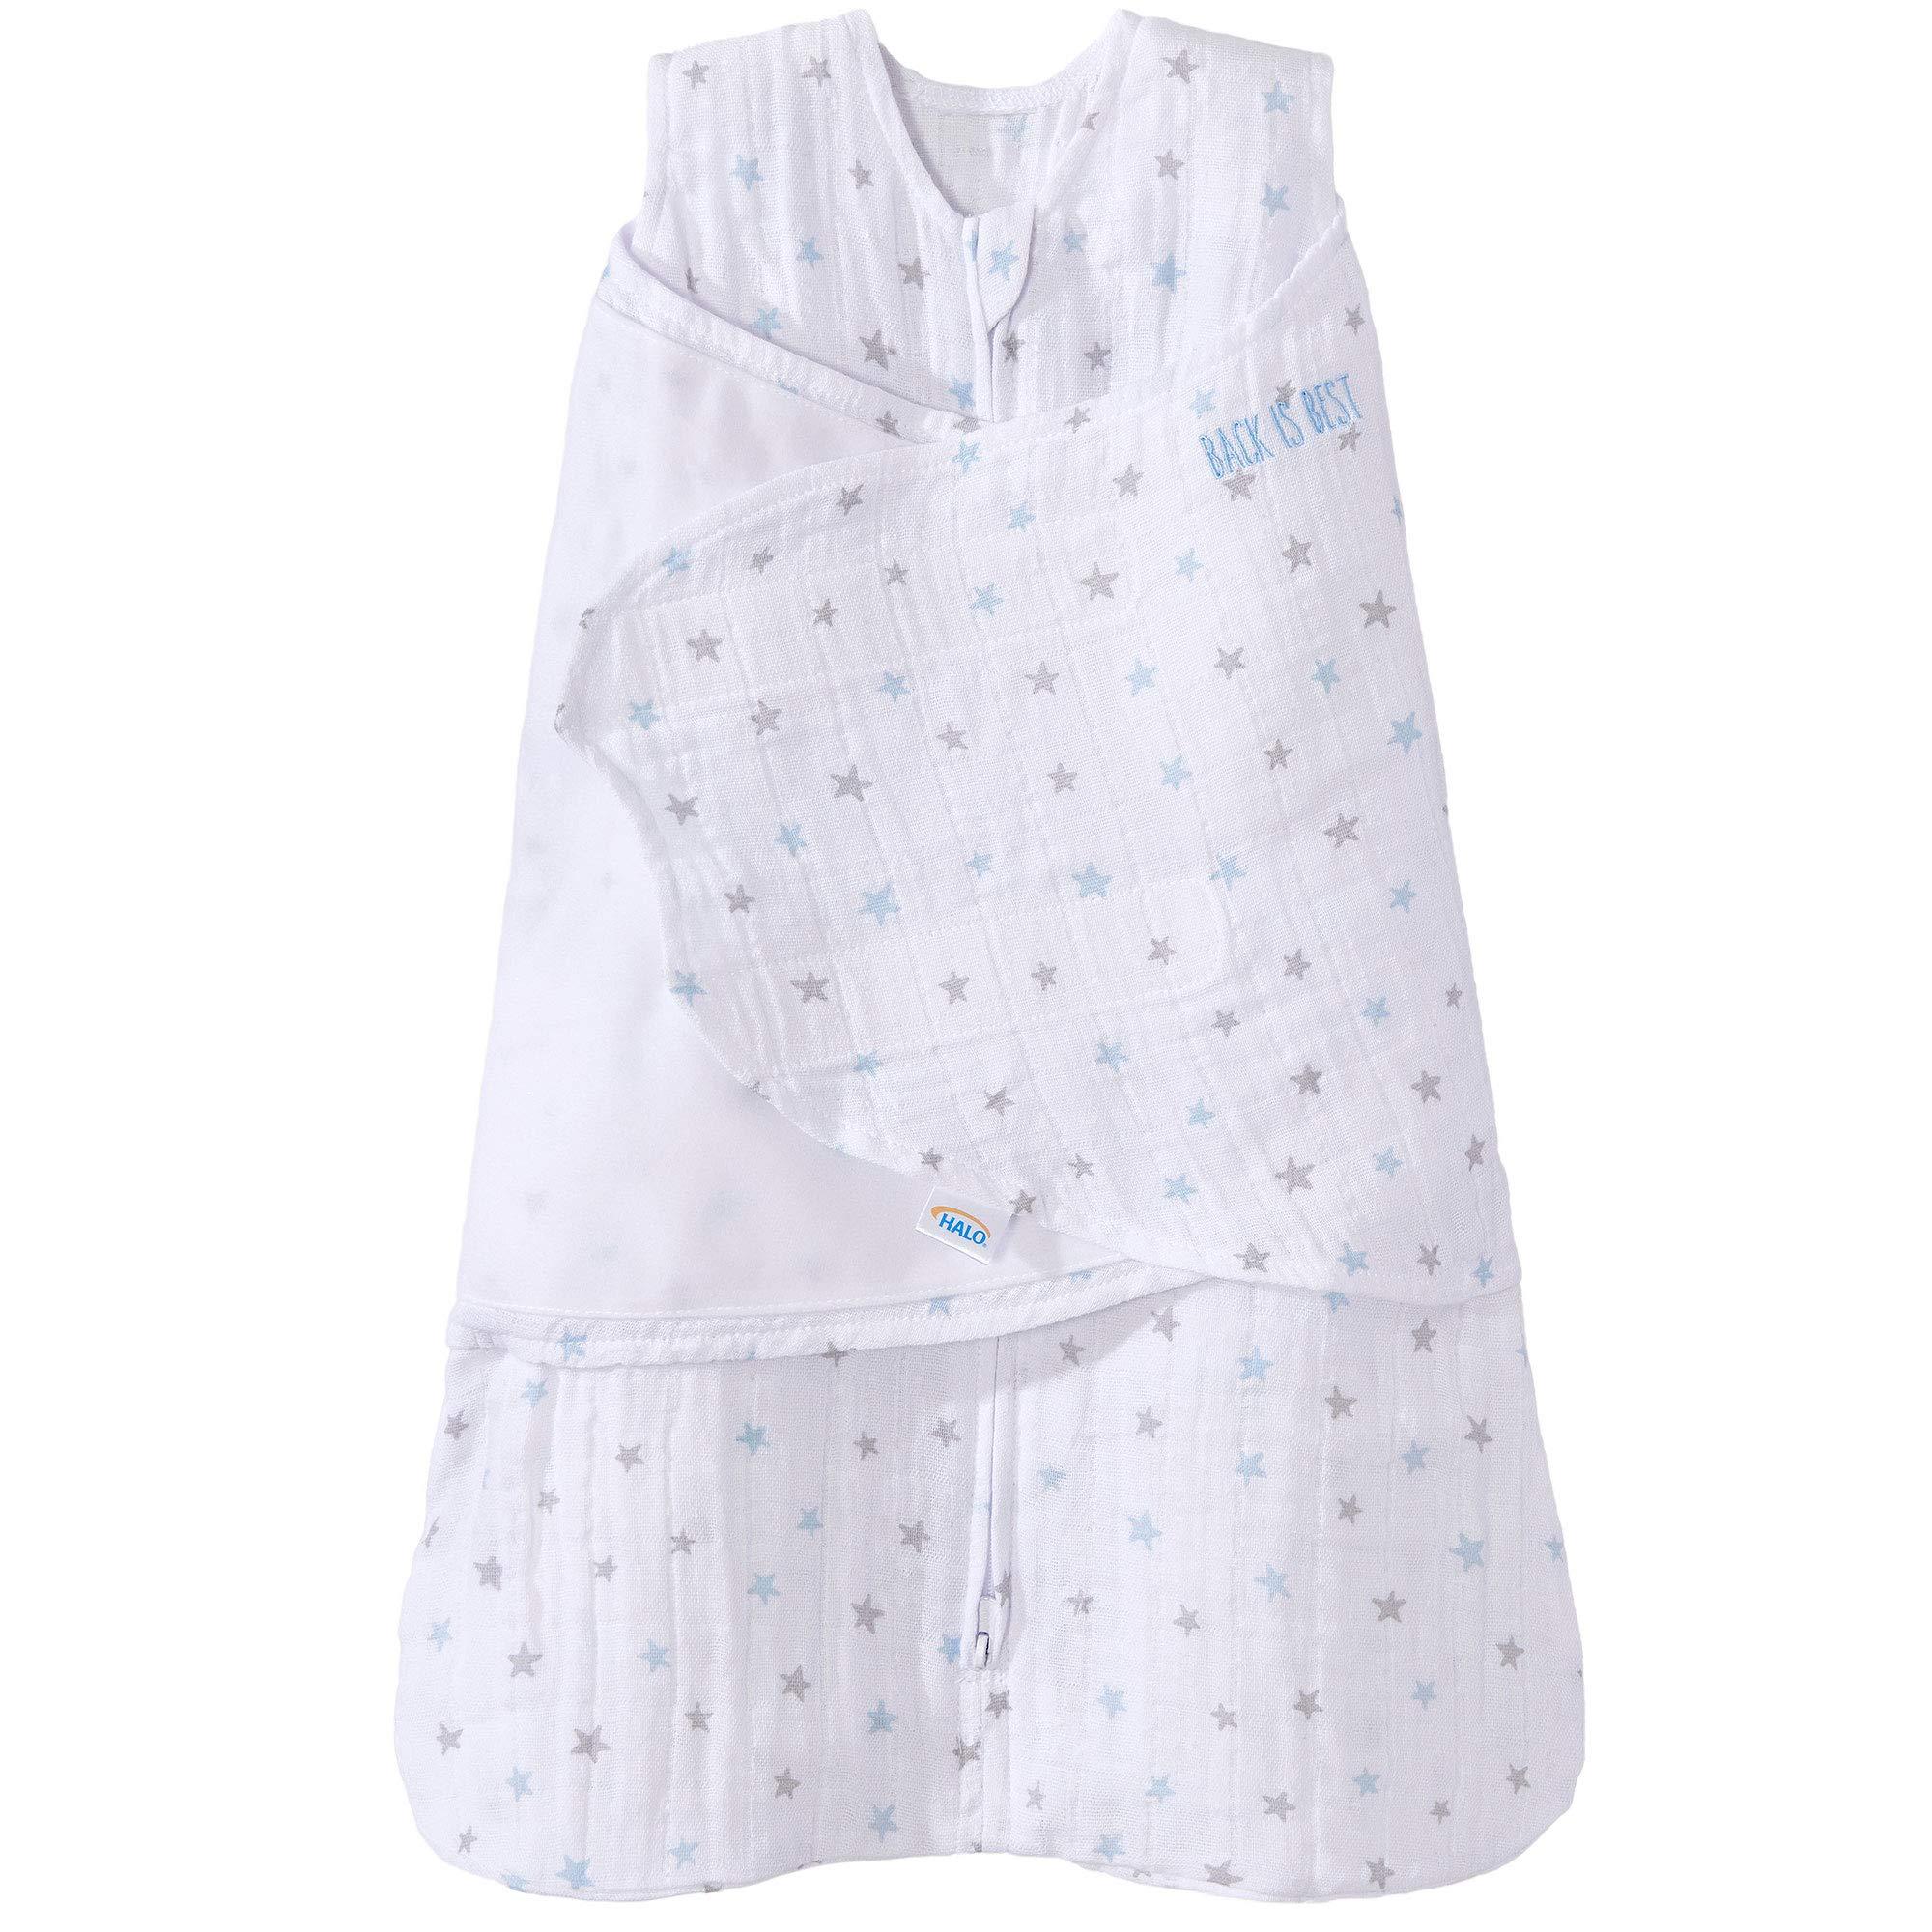 Halo 100% Cotton Muslin Sleepsack Swaddle Wearable Blanket, Blue Stars, Small